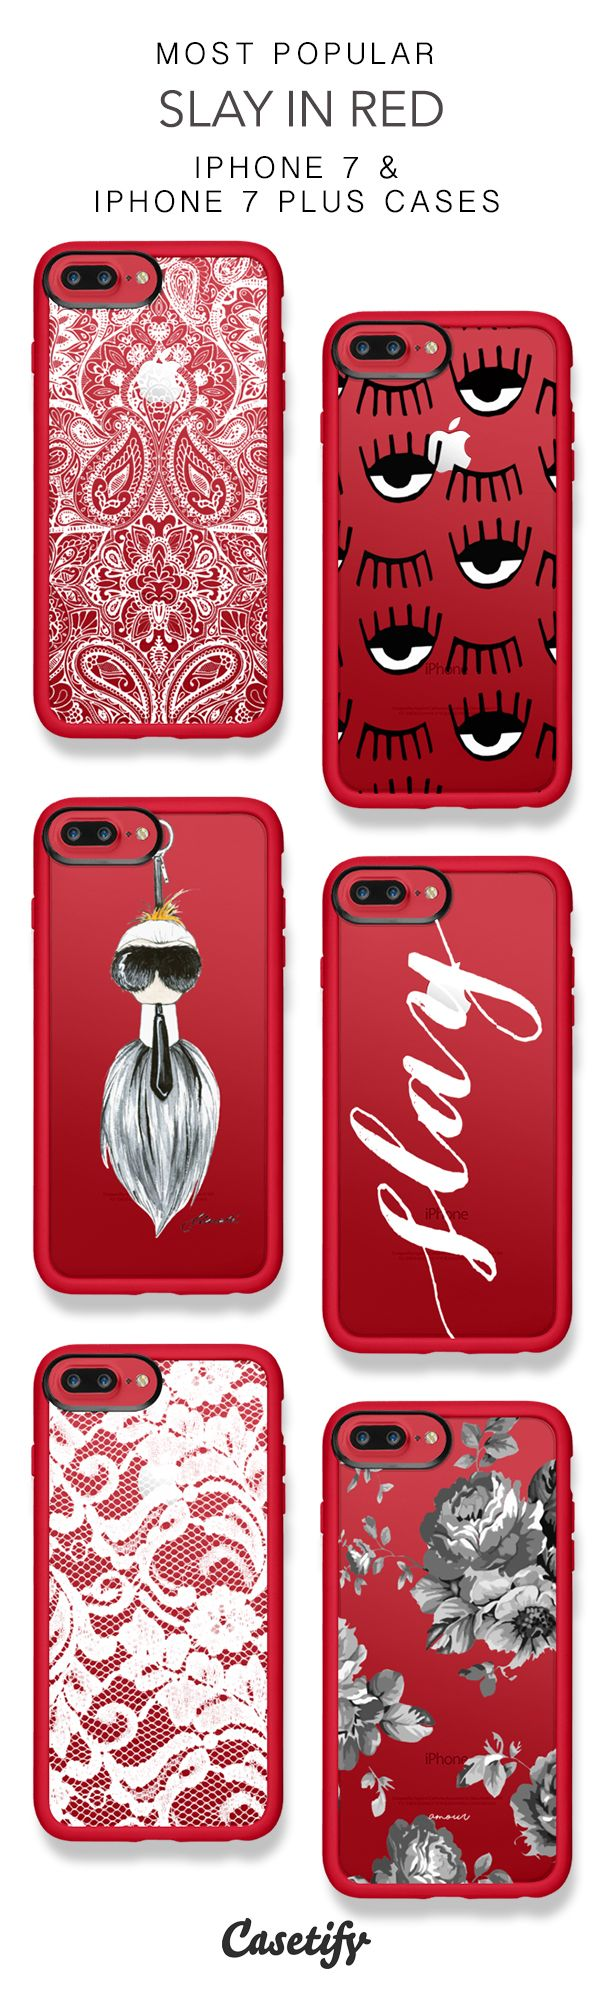 3bdf3d83552697bc4f4ba25cdb232dbb red iphone plus case iphone red